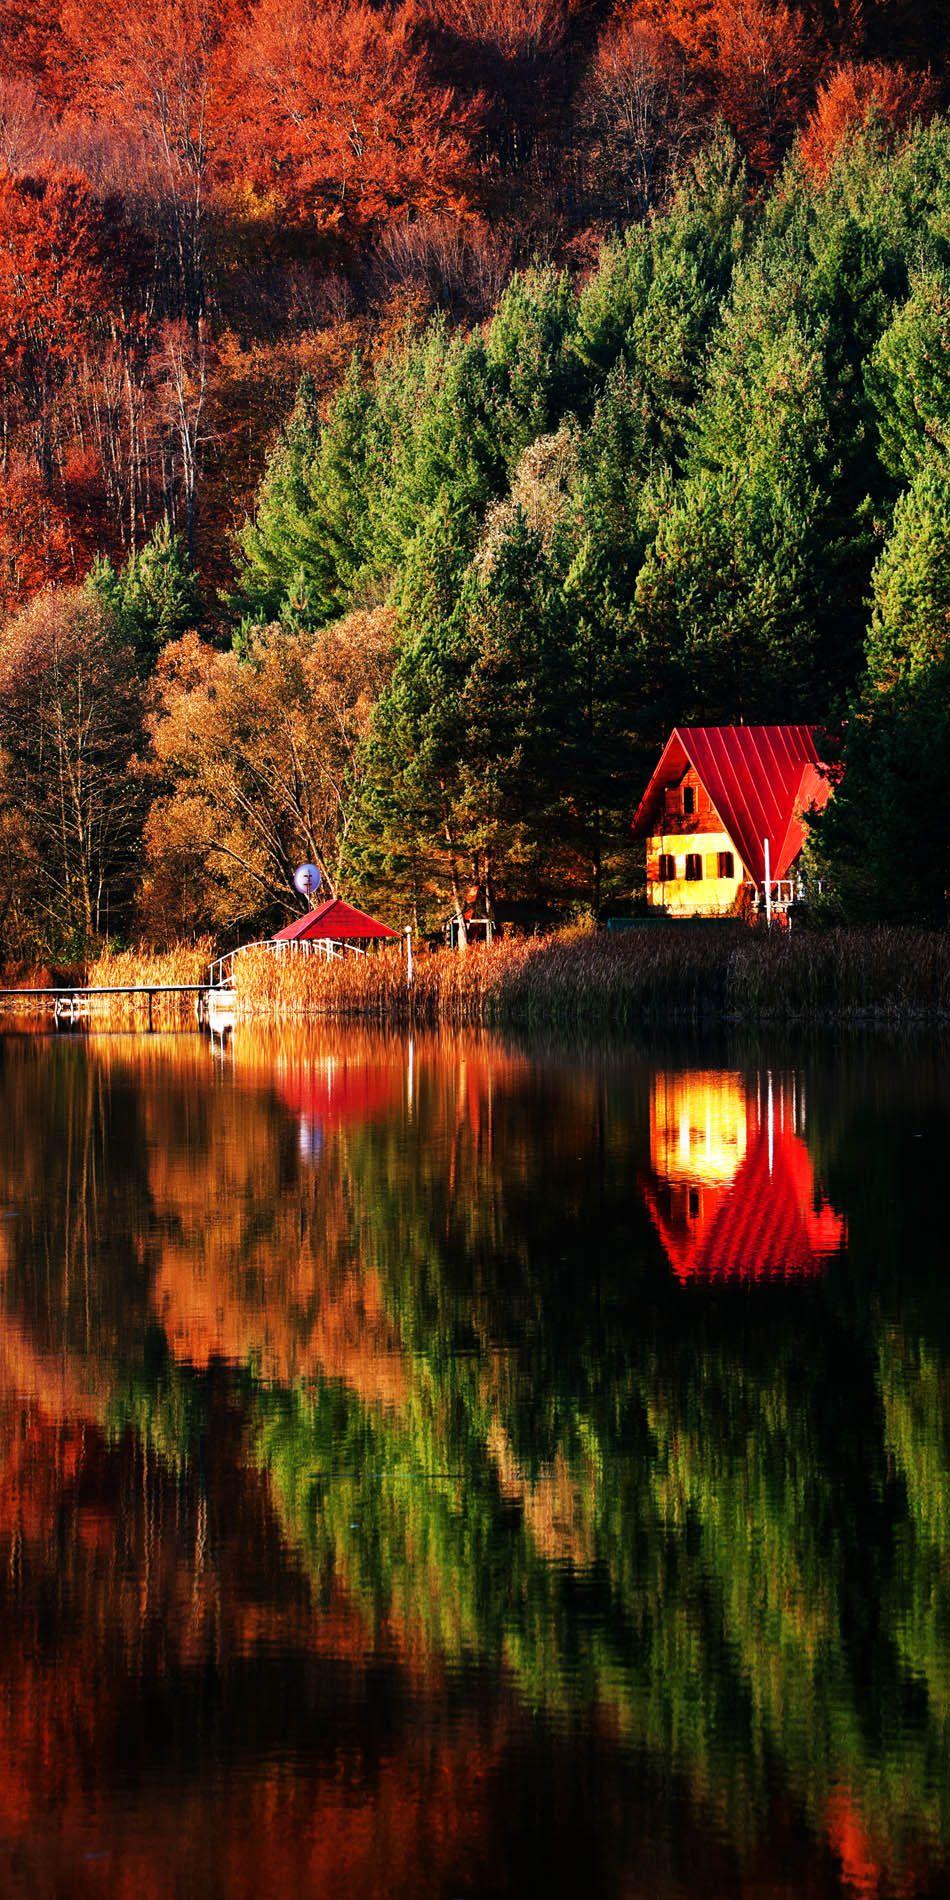 Discover Amazing Romania through 44 Spectacular Photos #autumncolors